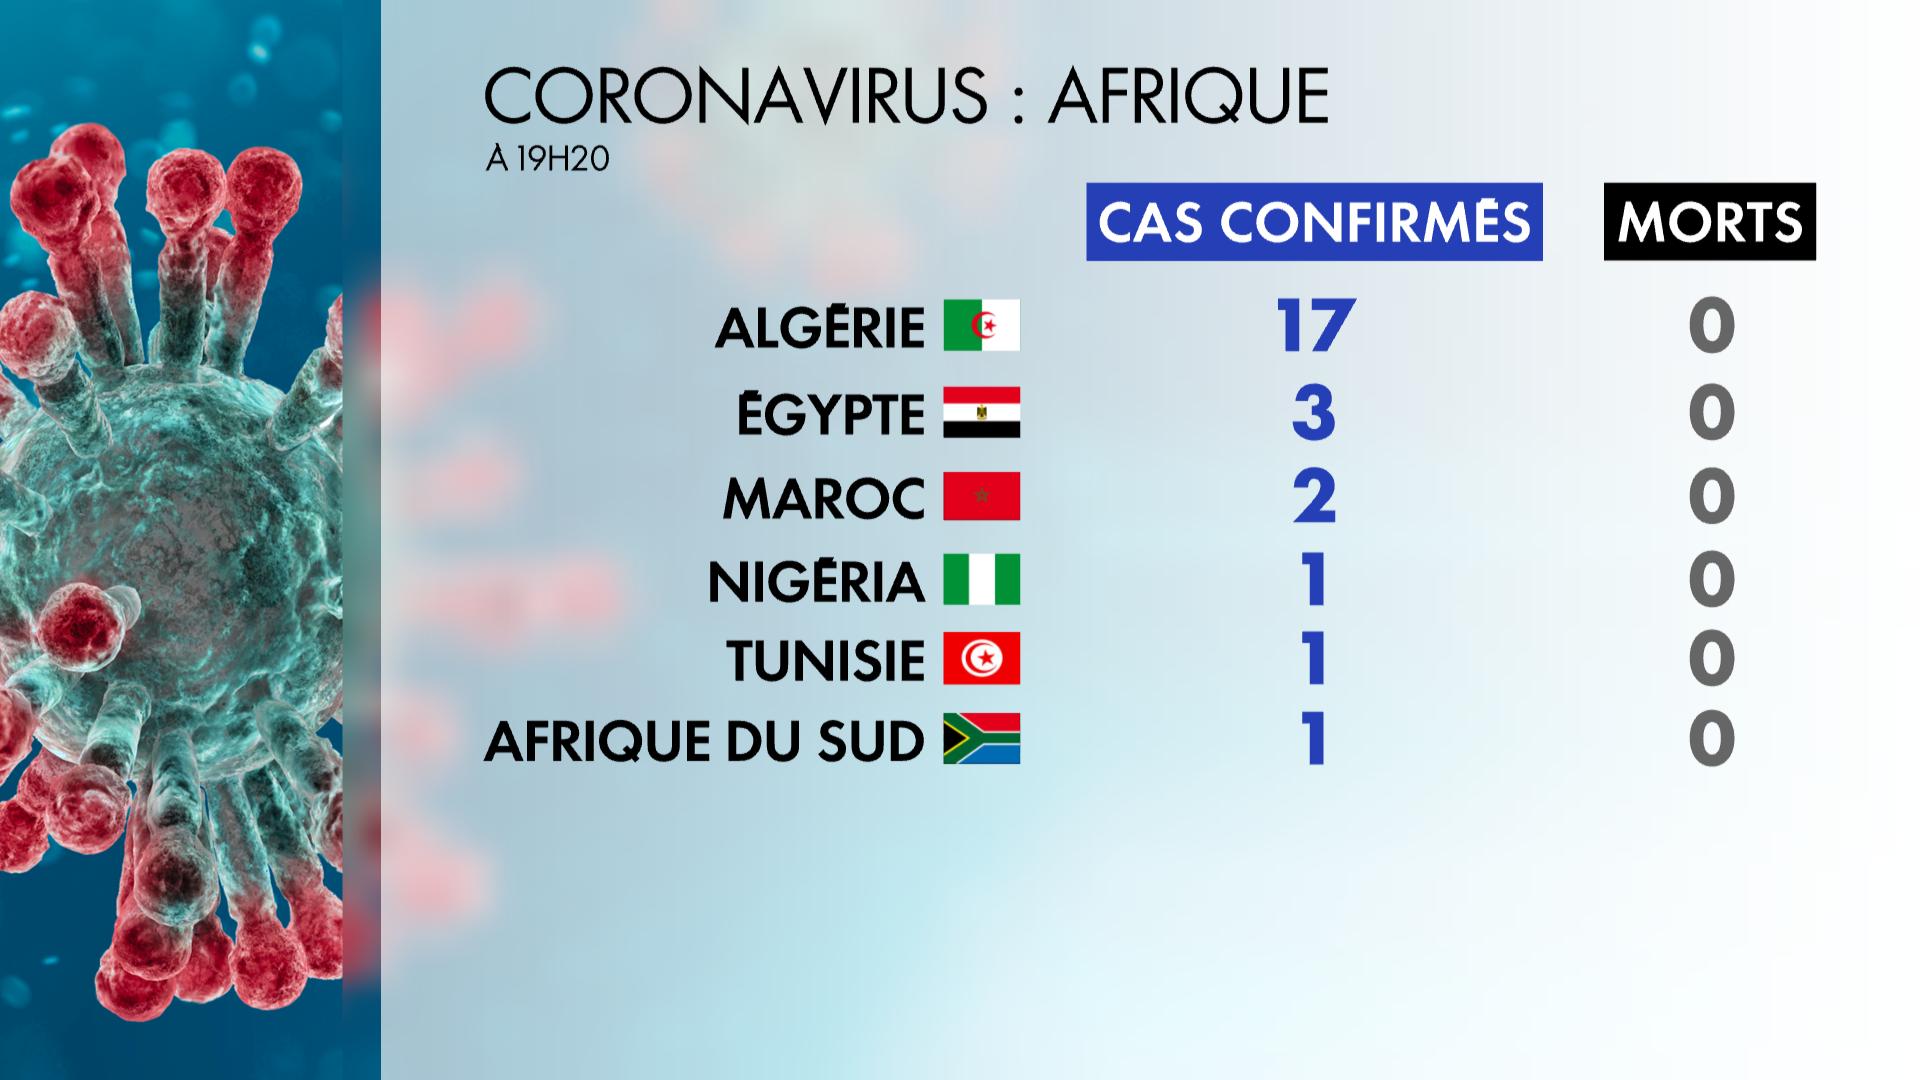 afrique_1920_5e6158506be77.jpg